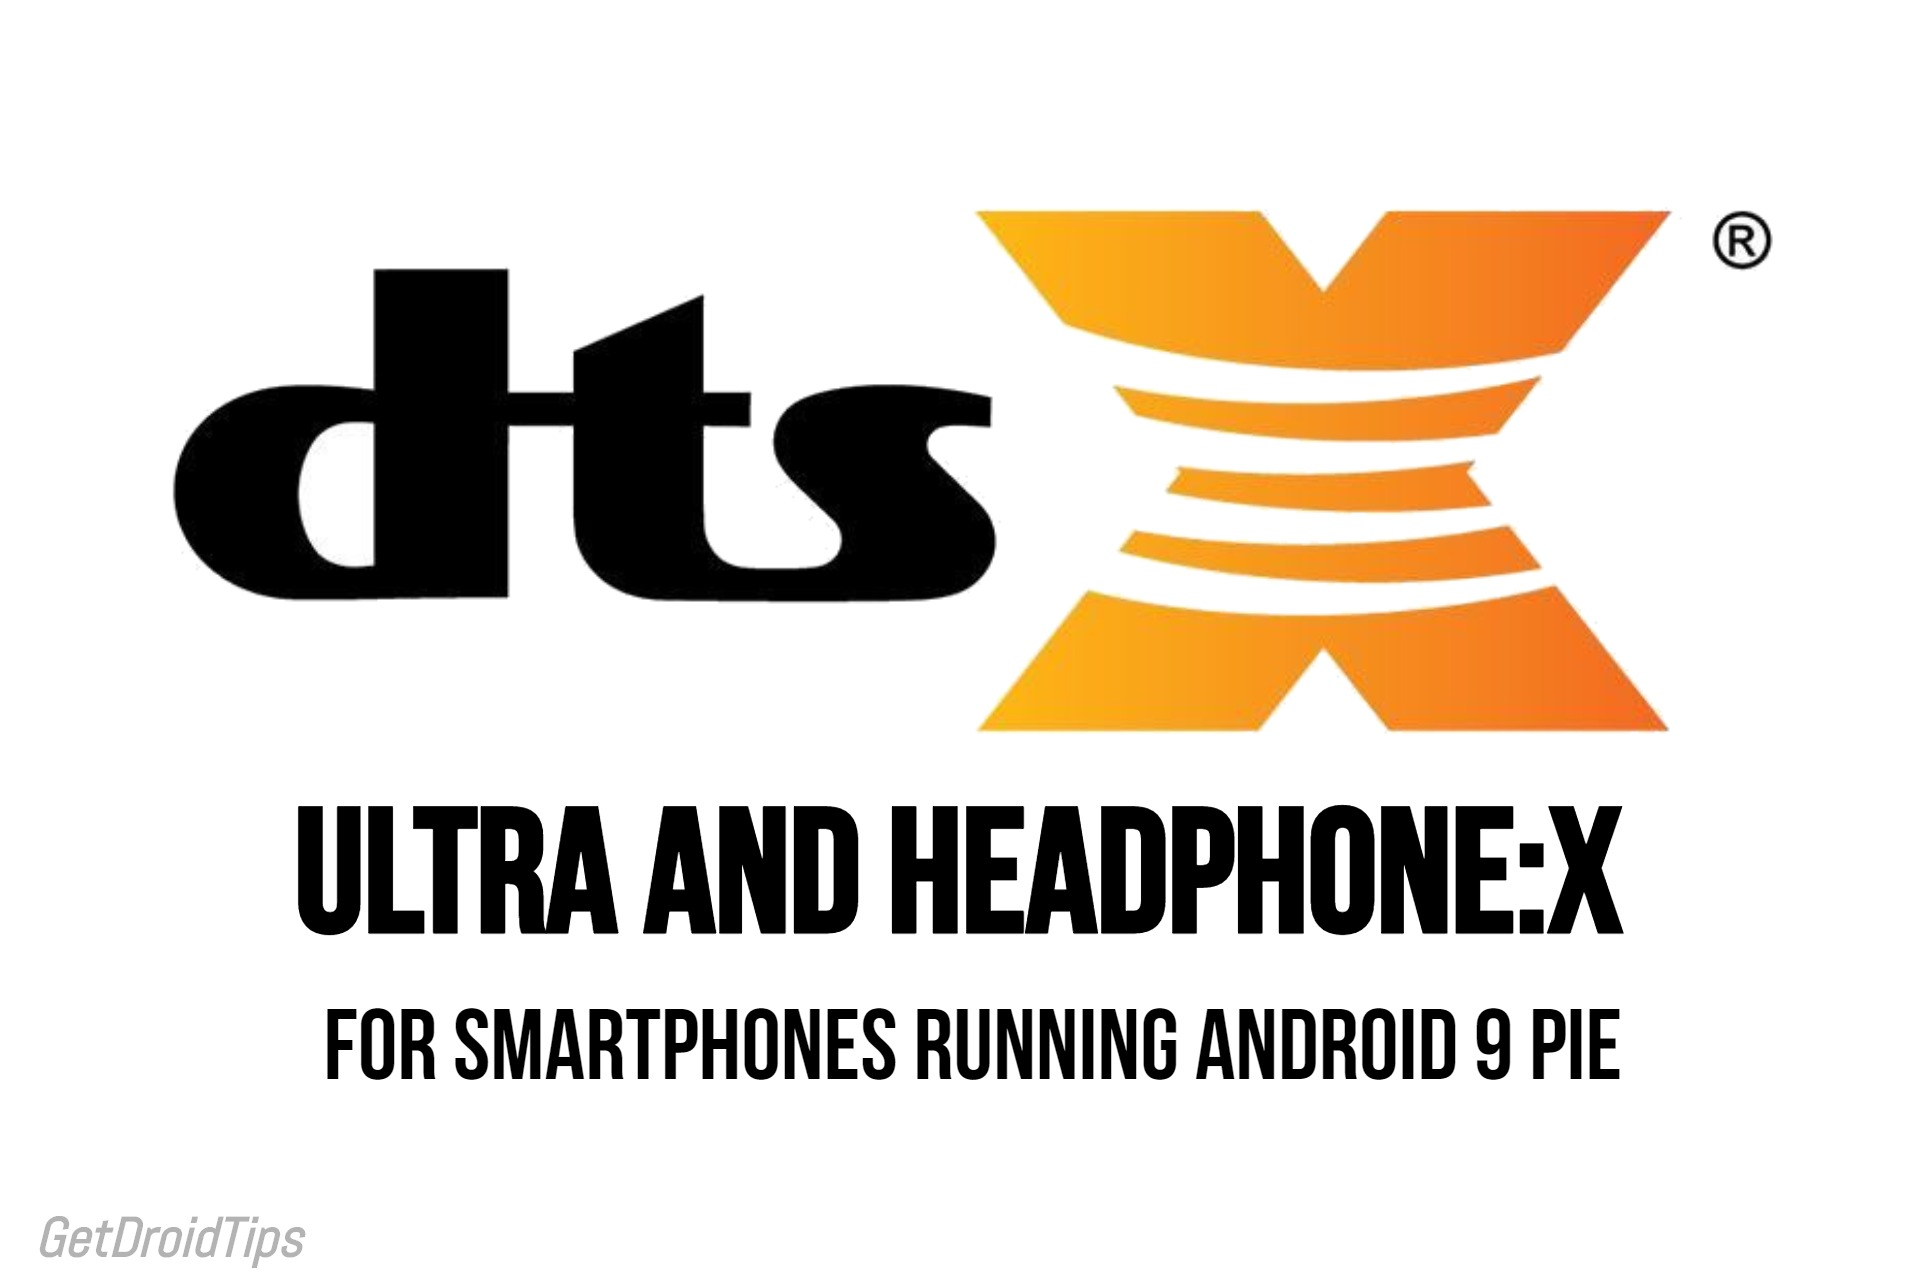 Instale DTS: X Ultra y DTS Headphone: X en dispositivos que ejecutan Android 9 Pie